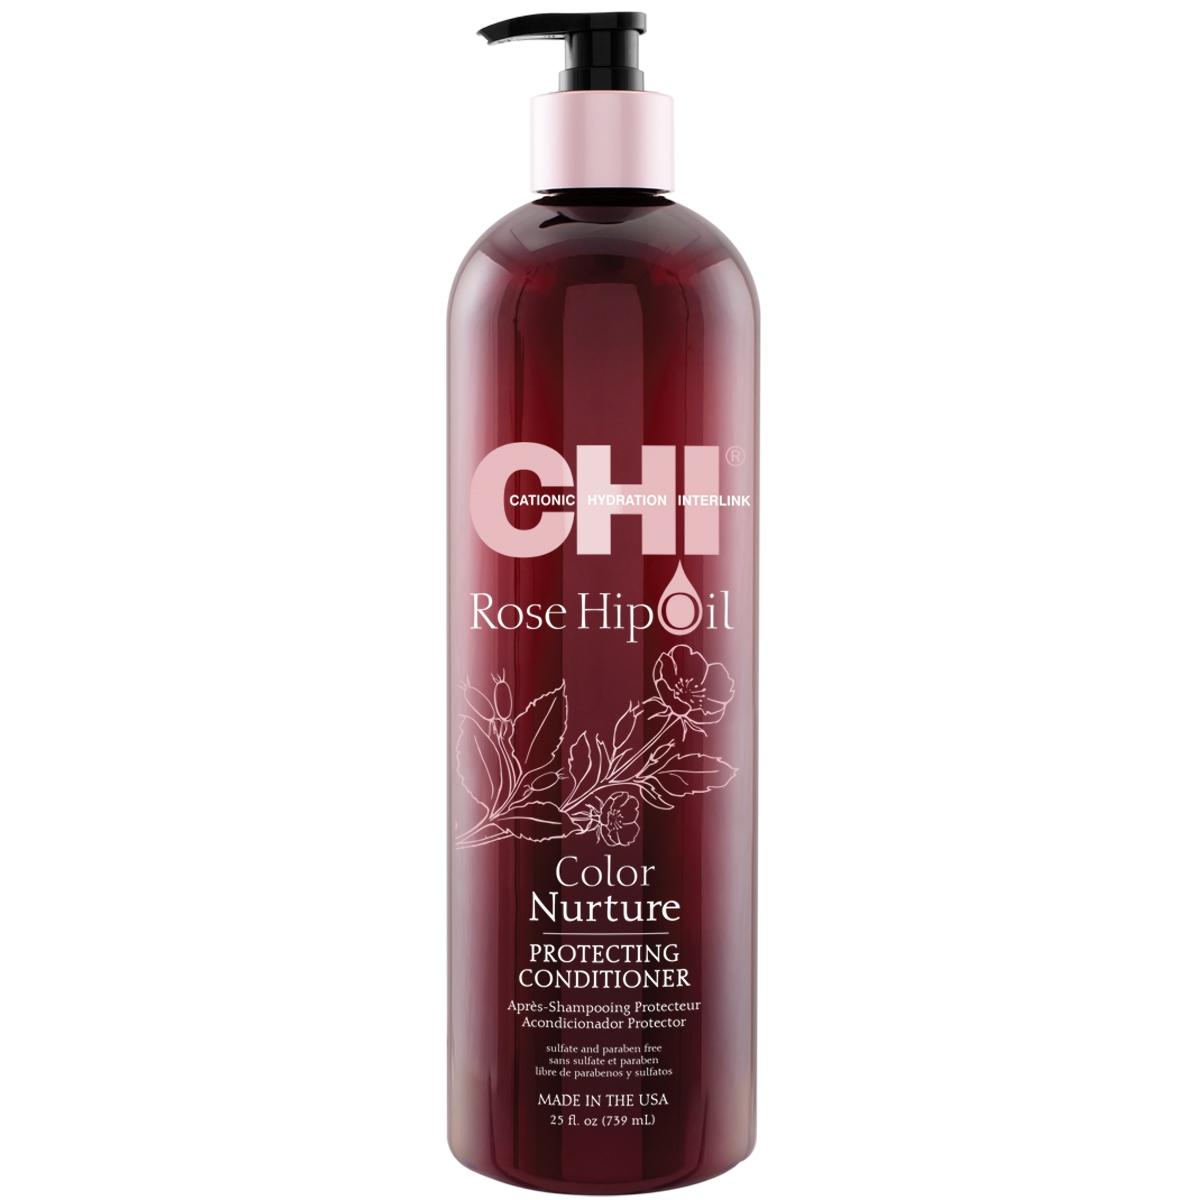 Chi Rose Hip Oil Color Nurture Protecting Conditioner 739ml